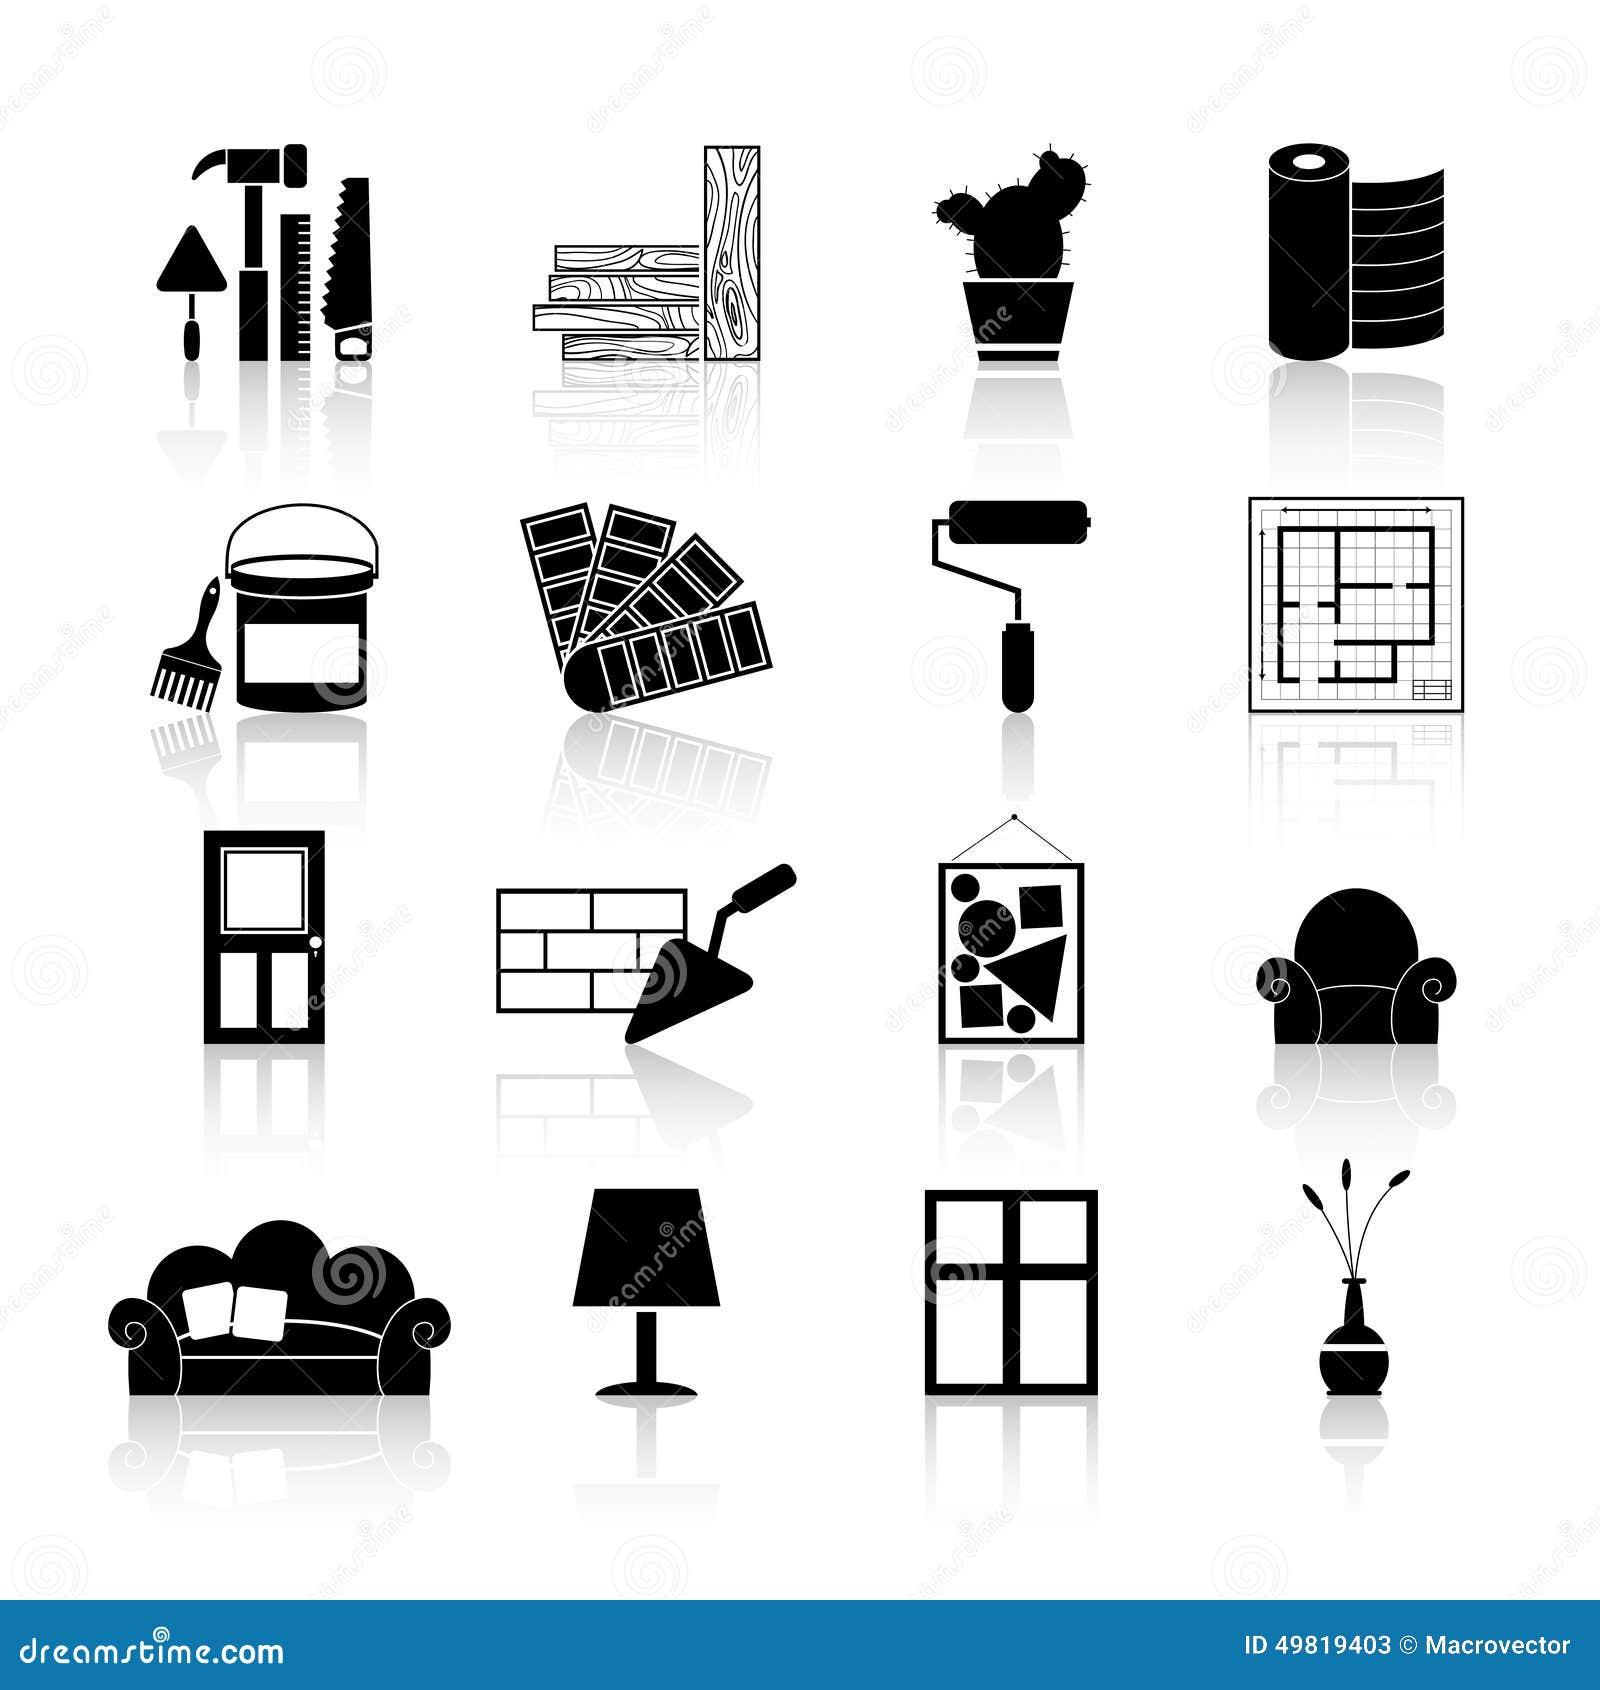 Interior Design Line Art Vector : Interior design icons black stock vector image